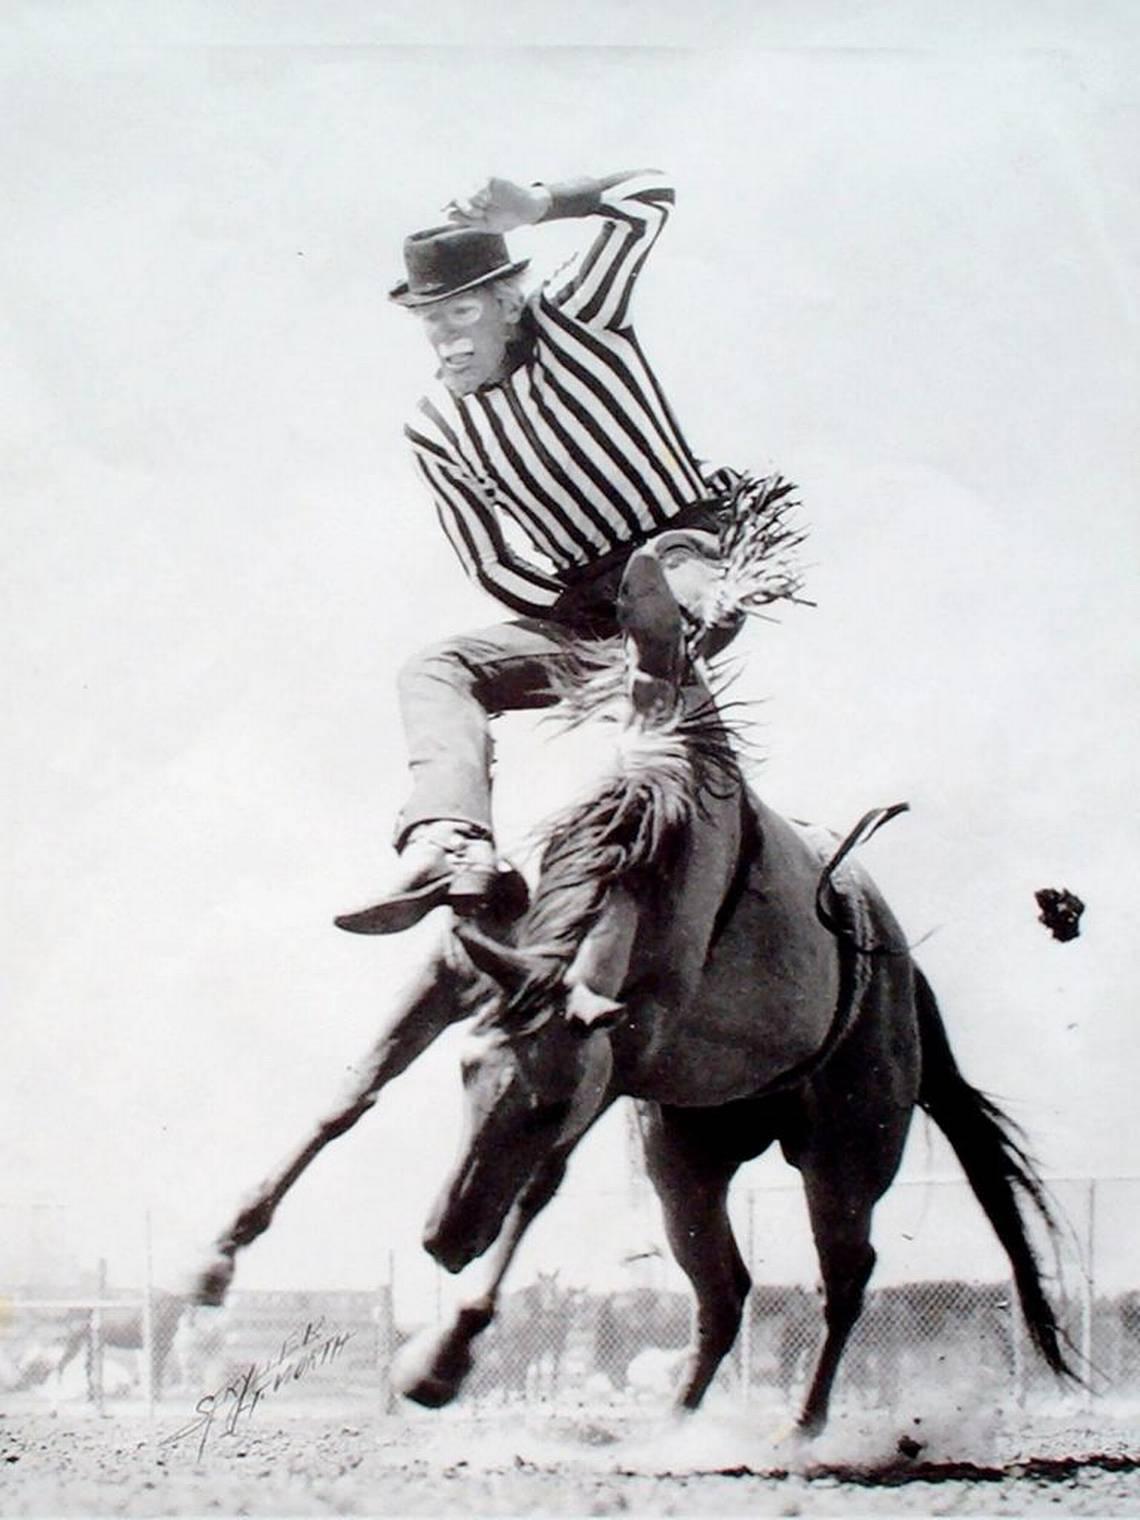 Wilbur Flyin!